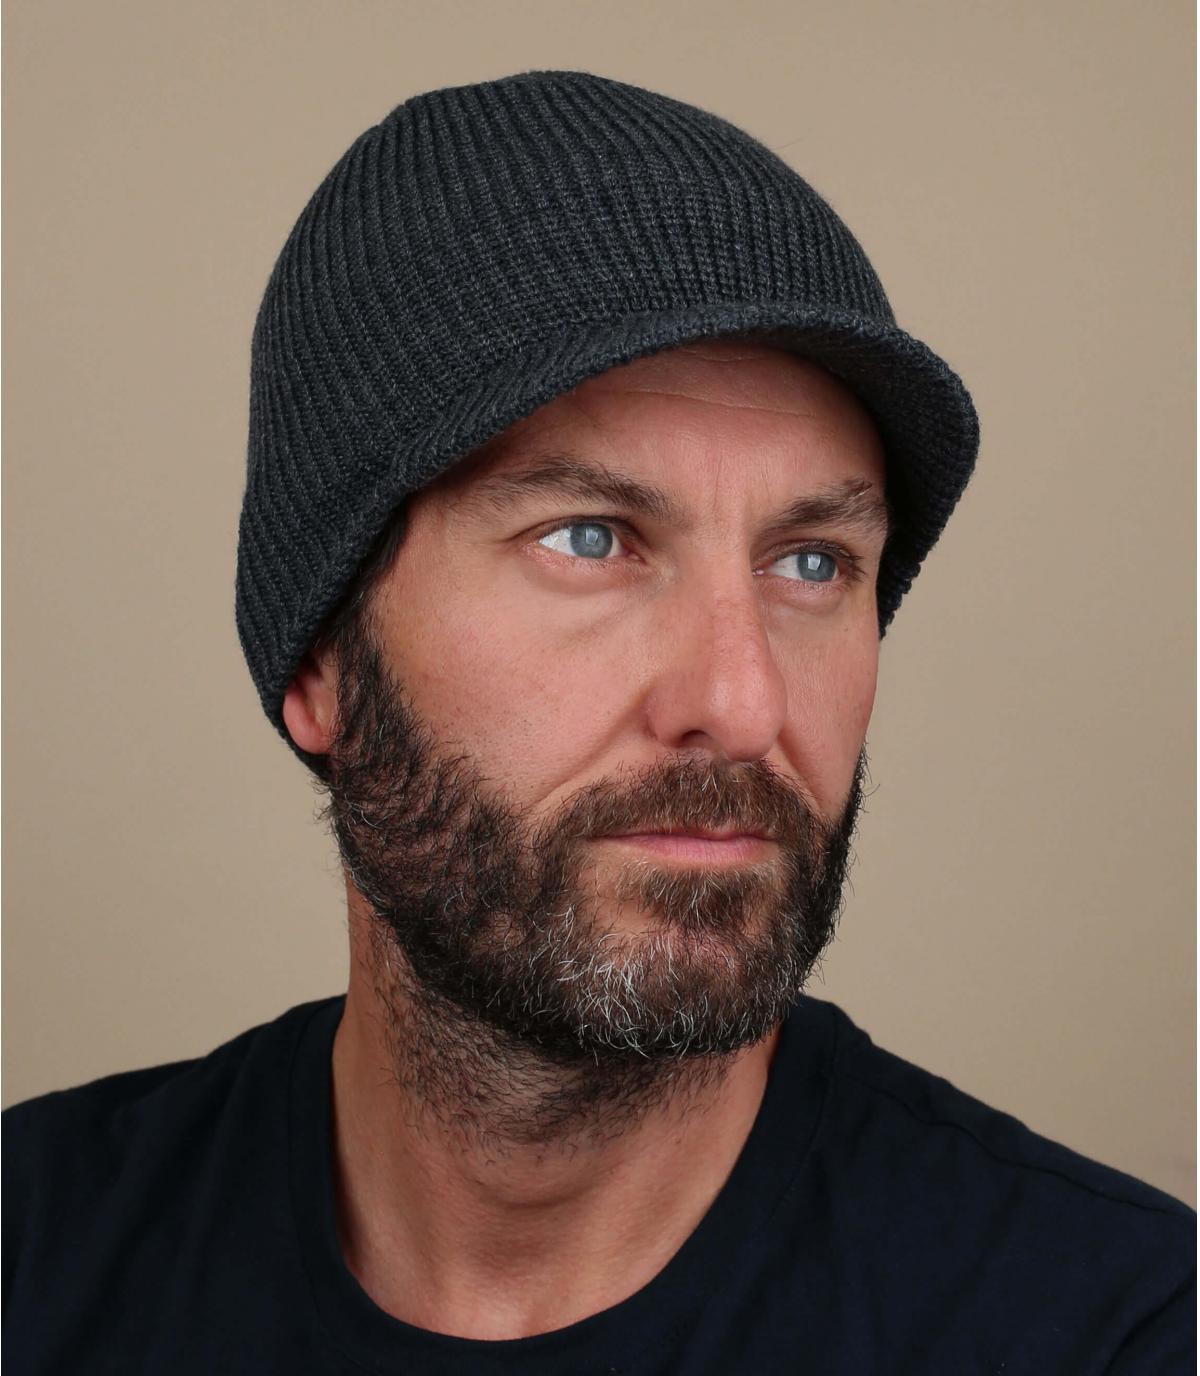 Cappello con visiera grigia Volcom